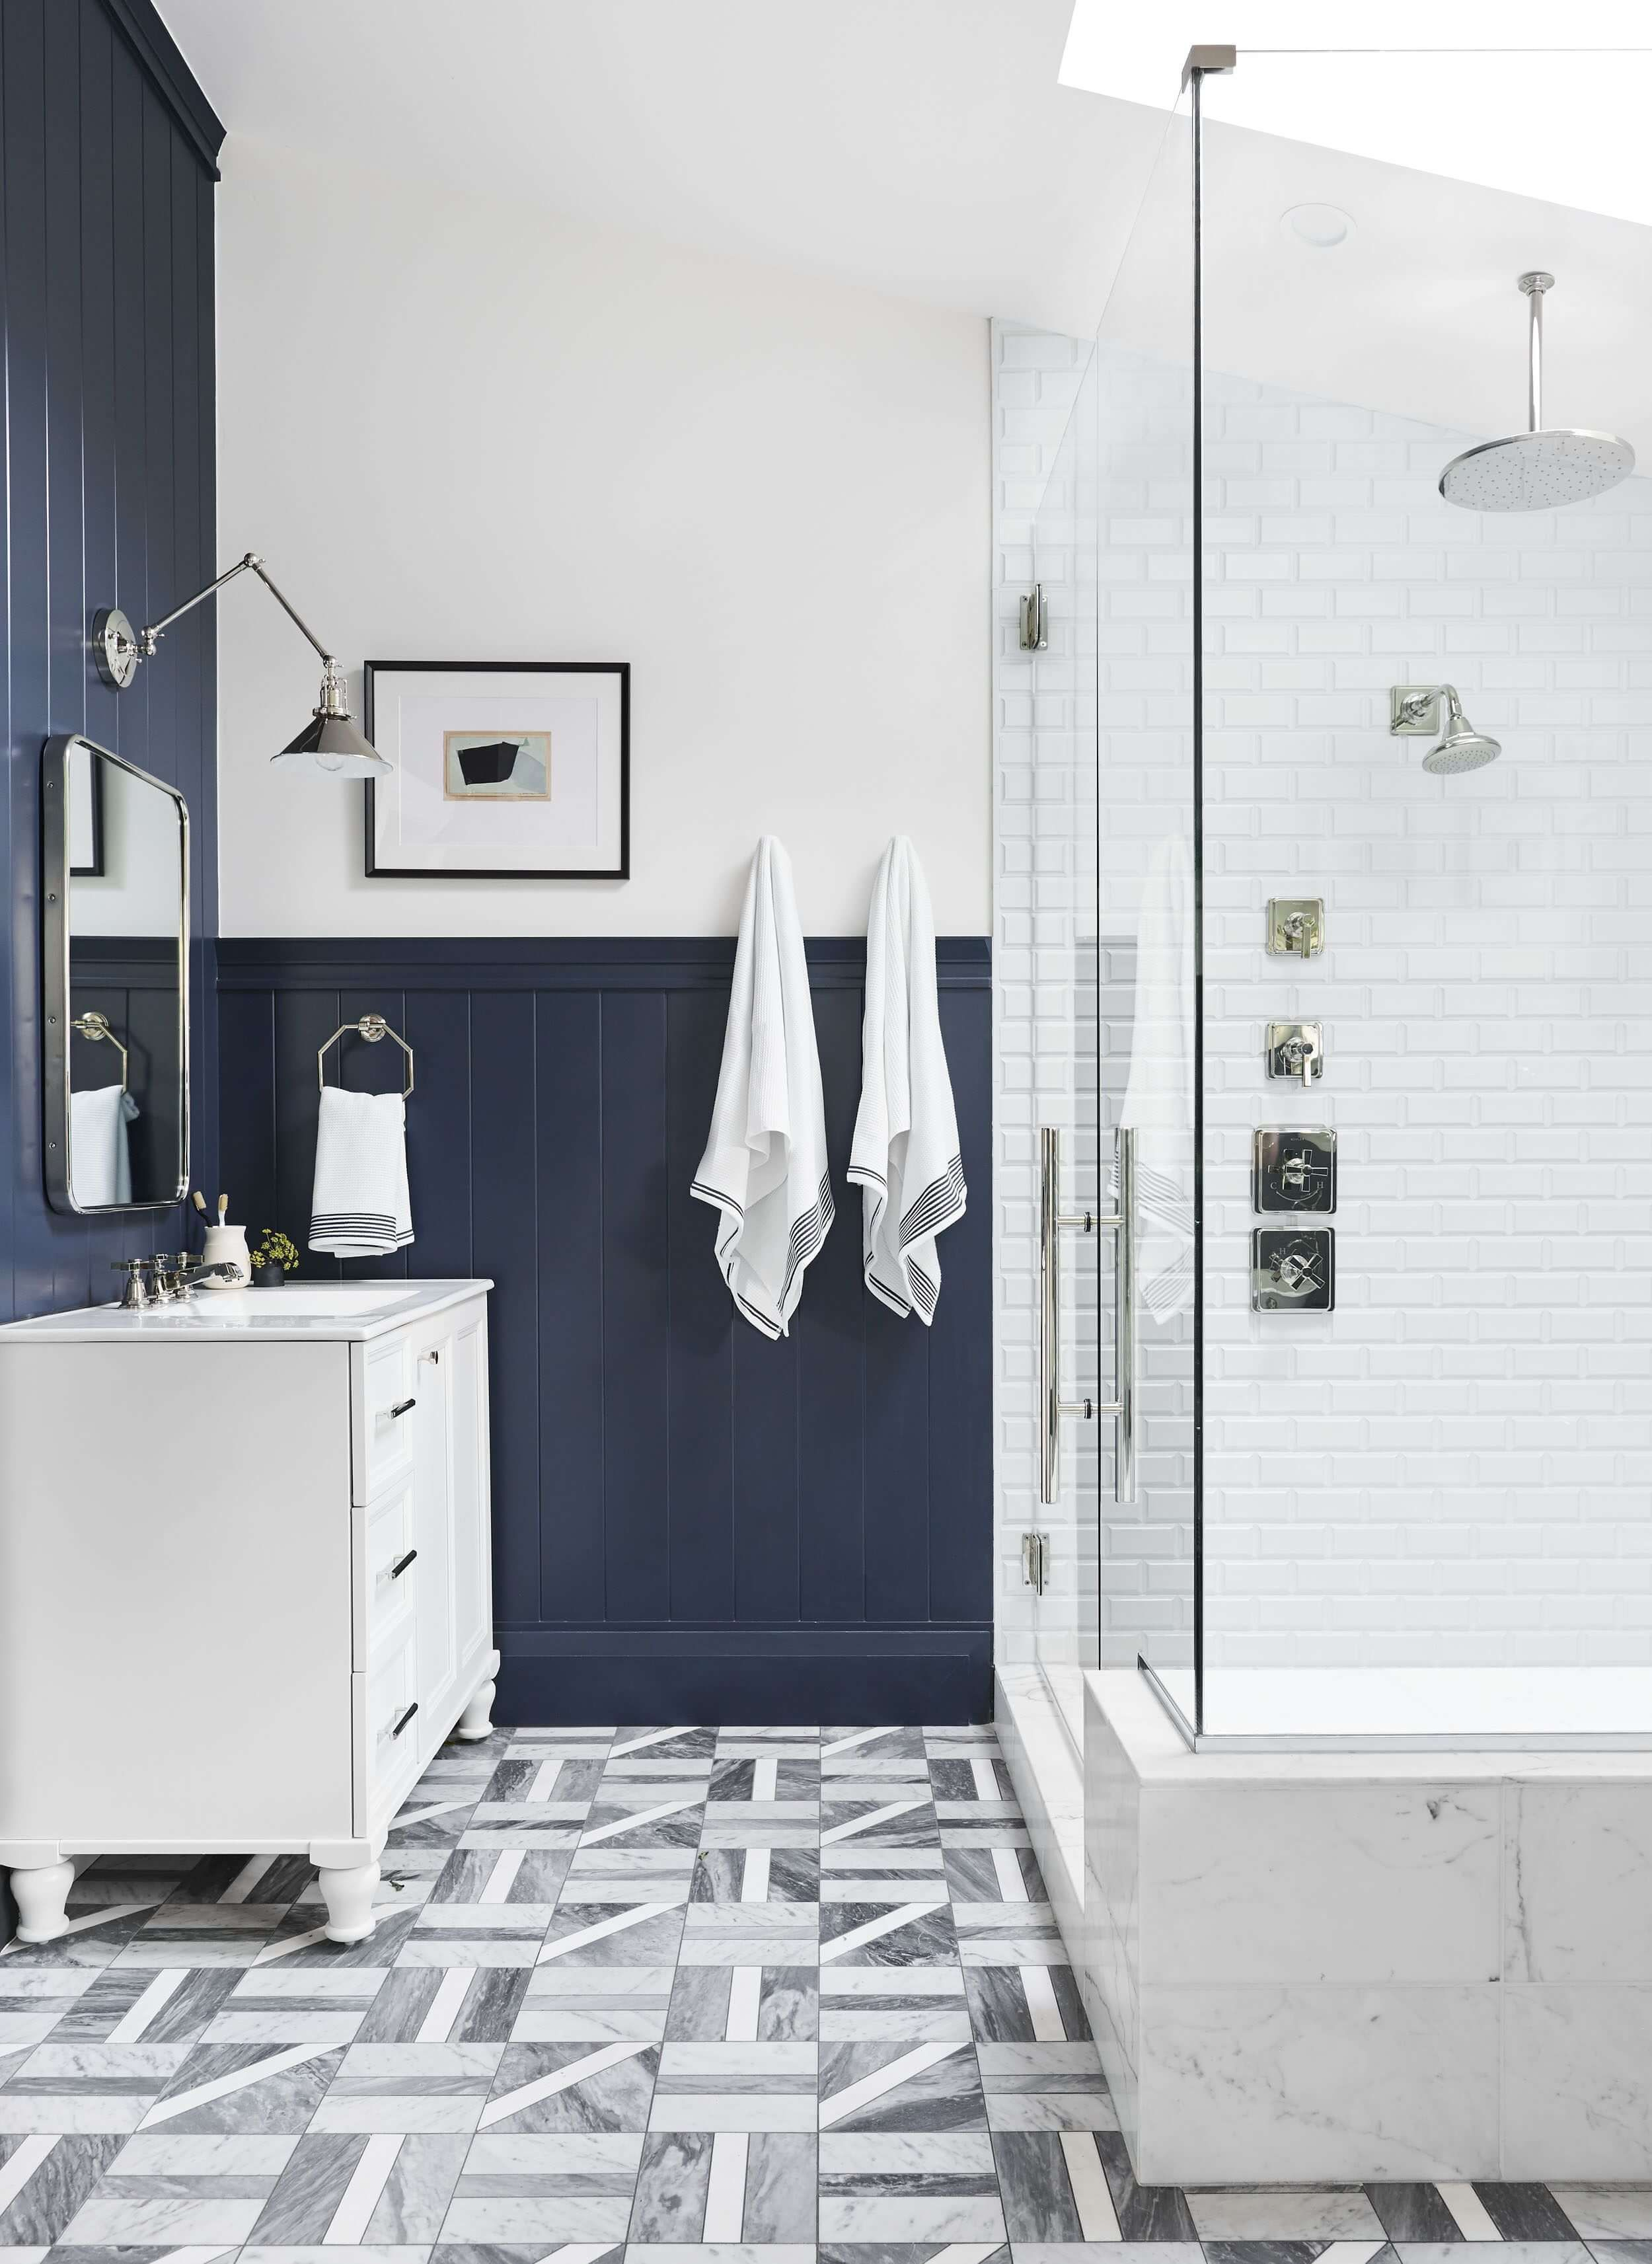 4 Unique Master Bathroom Ideas 4 (You Can Try Today) - Dovenda